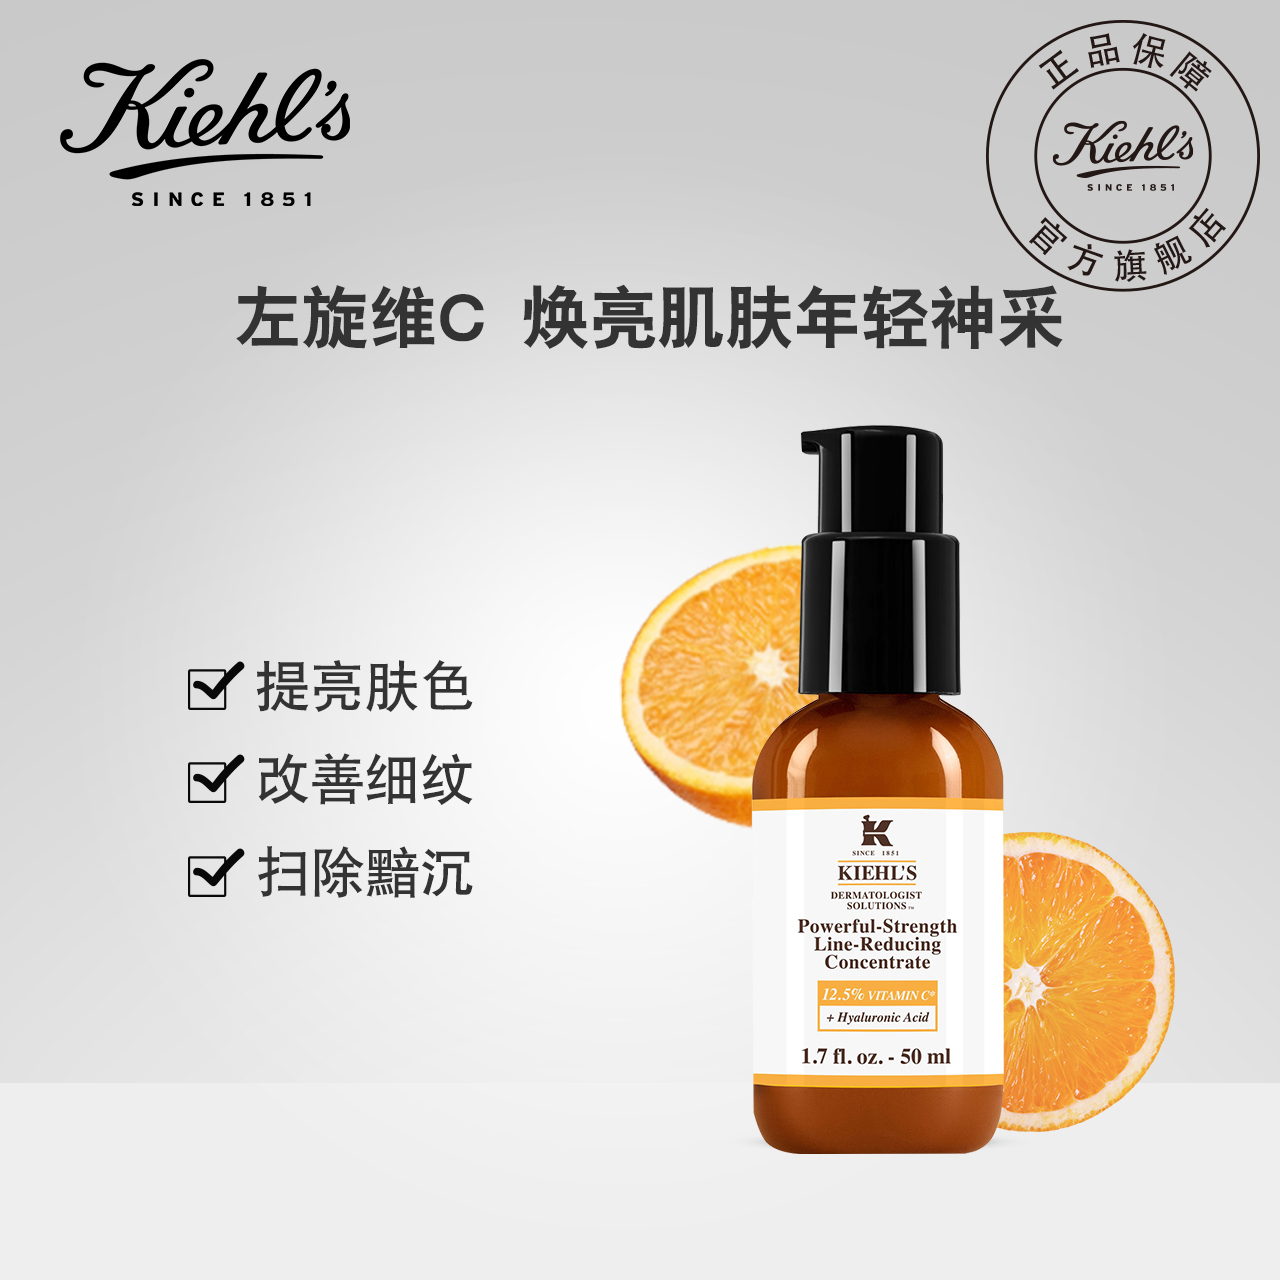 C  淡化细纹 50ml kiehls 科颜氏维生素 紧肤精华乳液